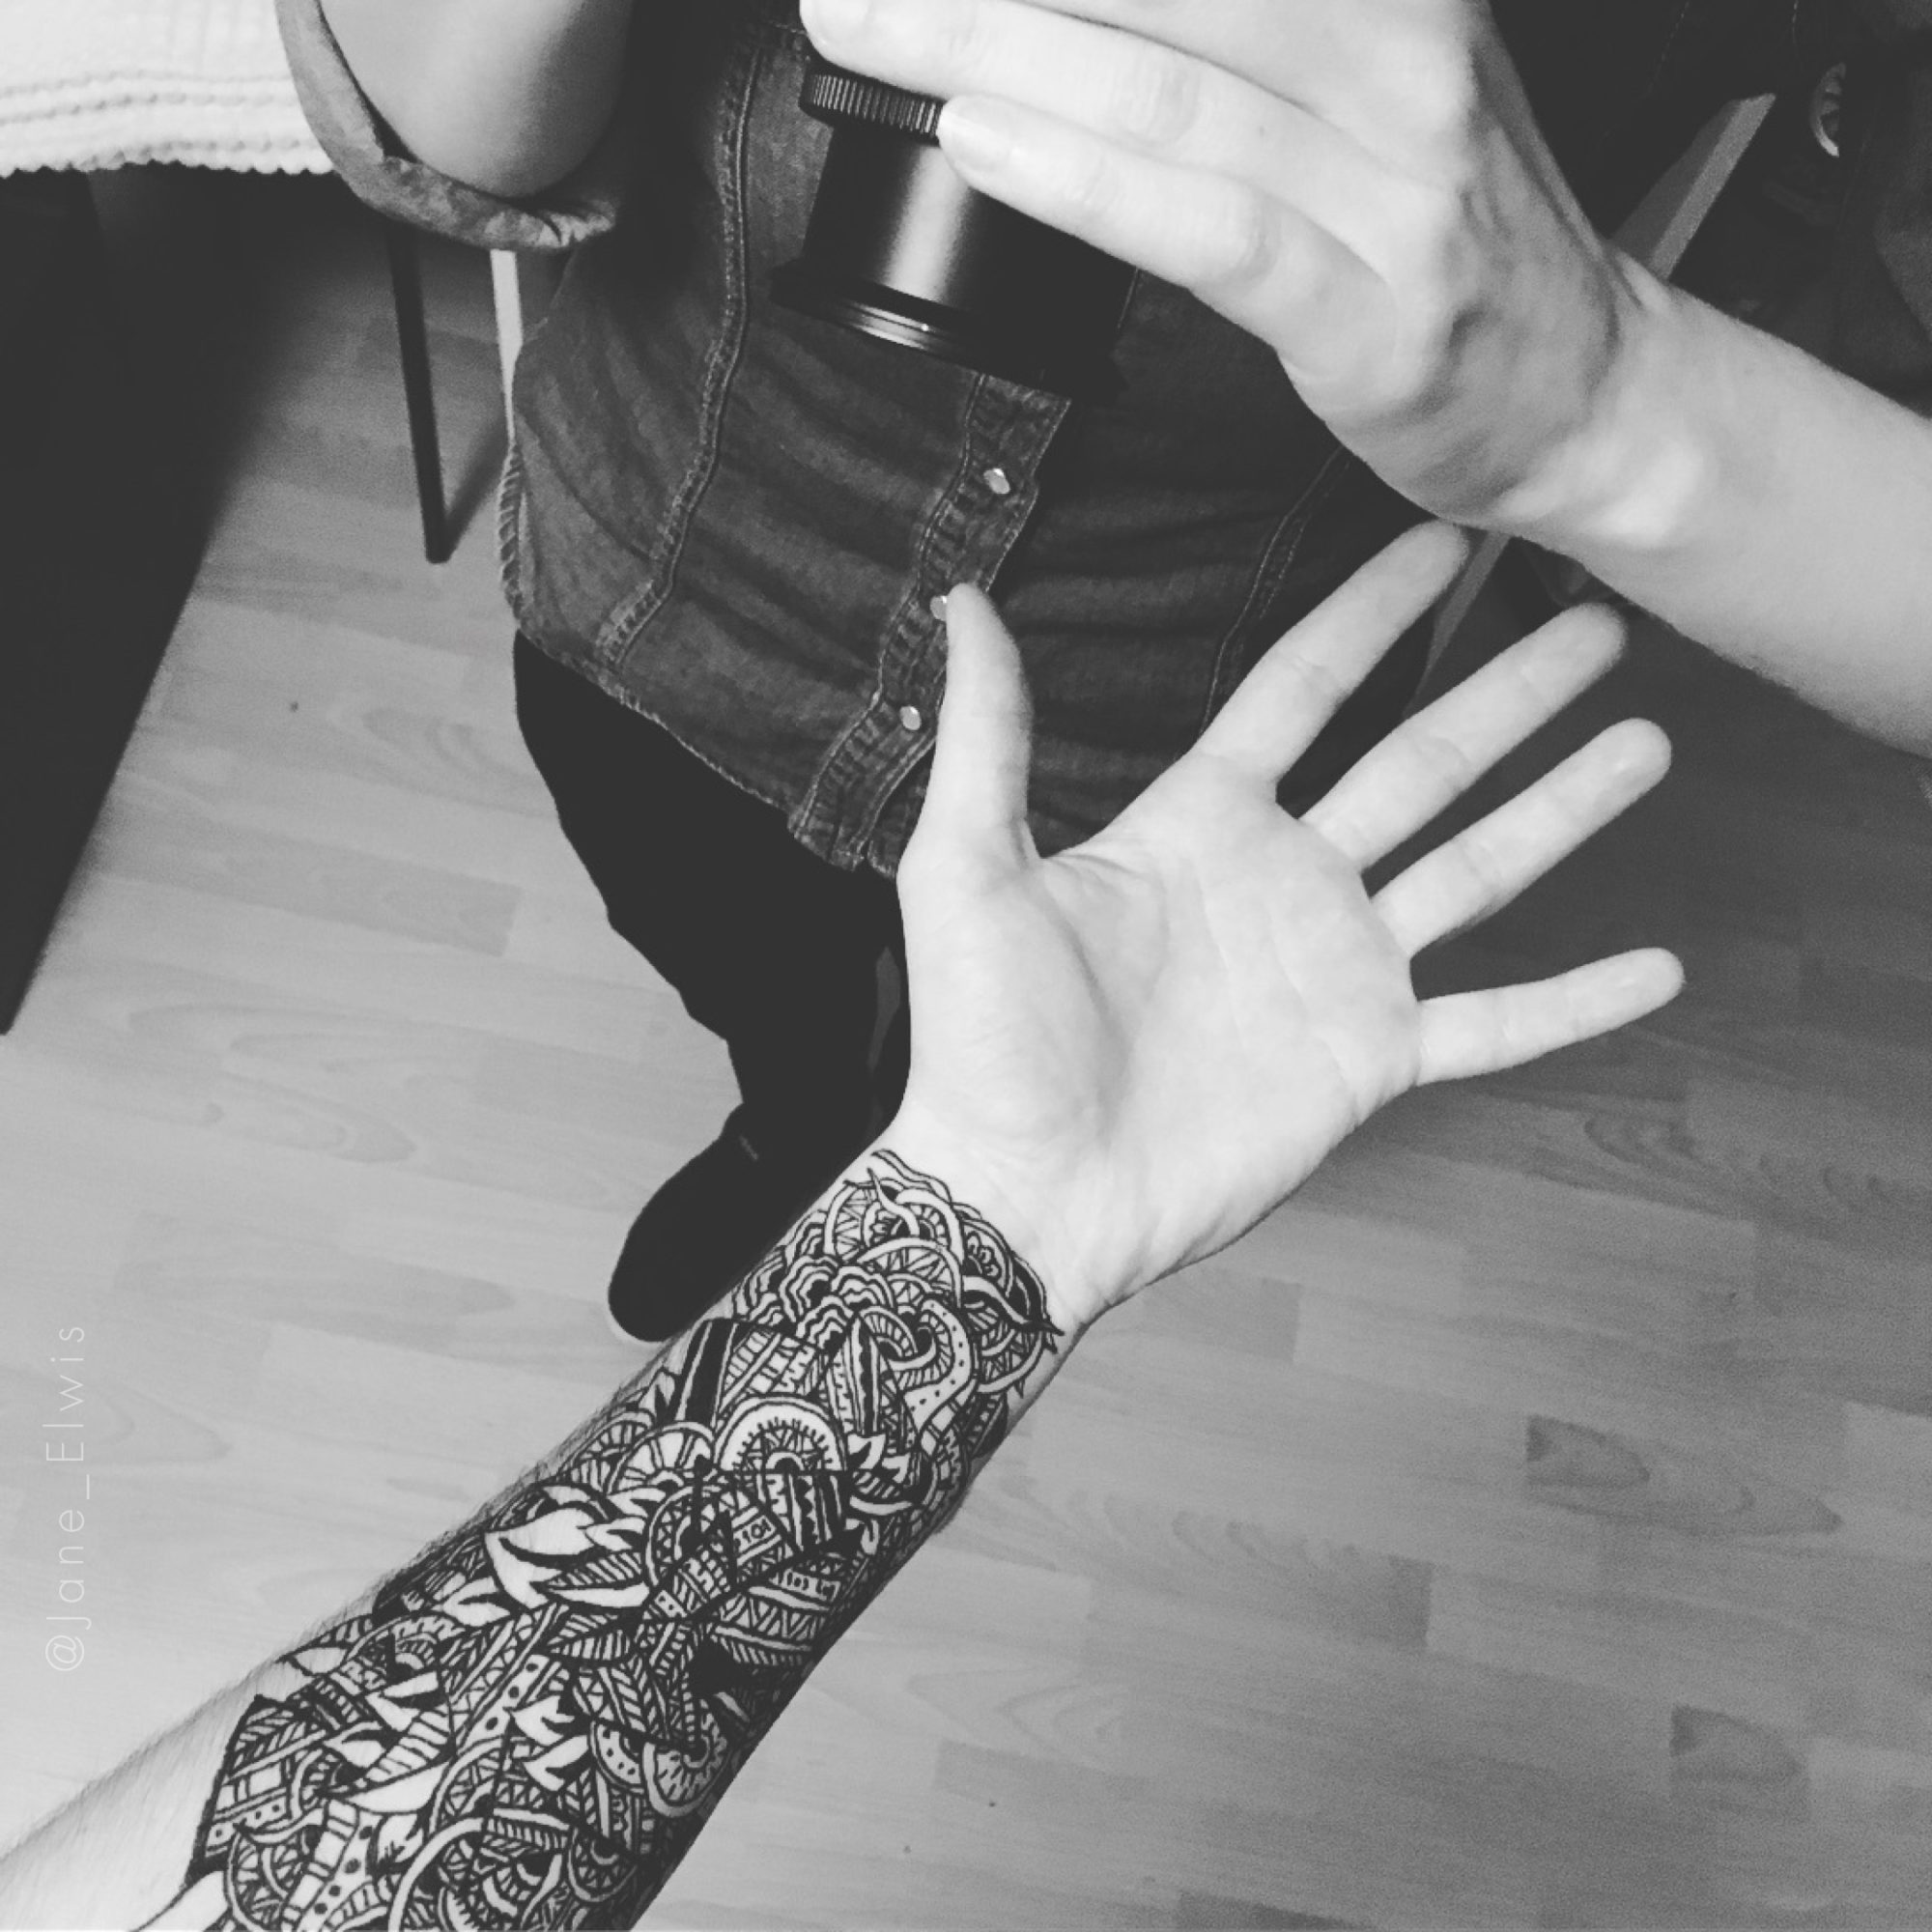 jane-elwis-tattoomania